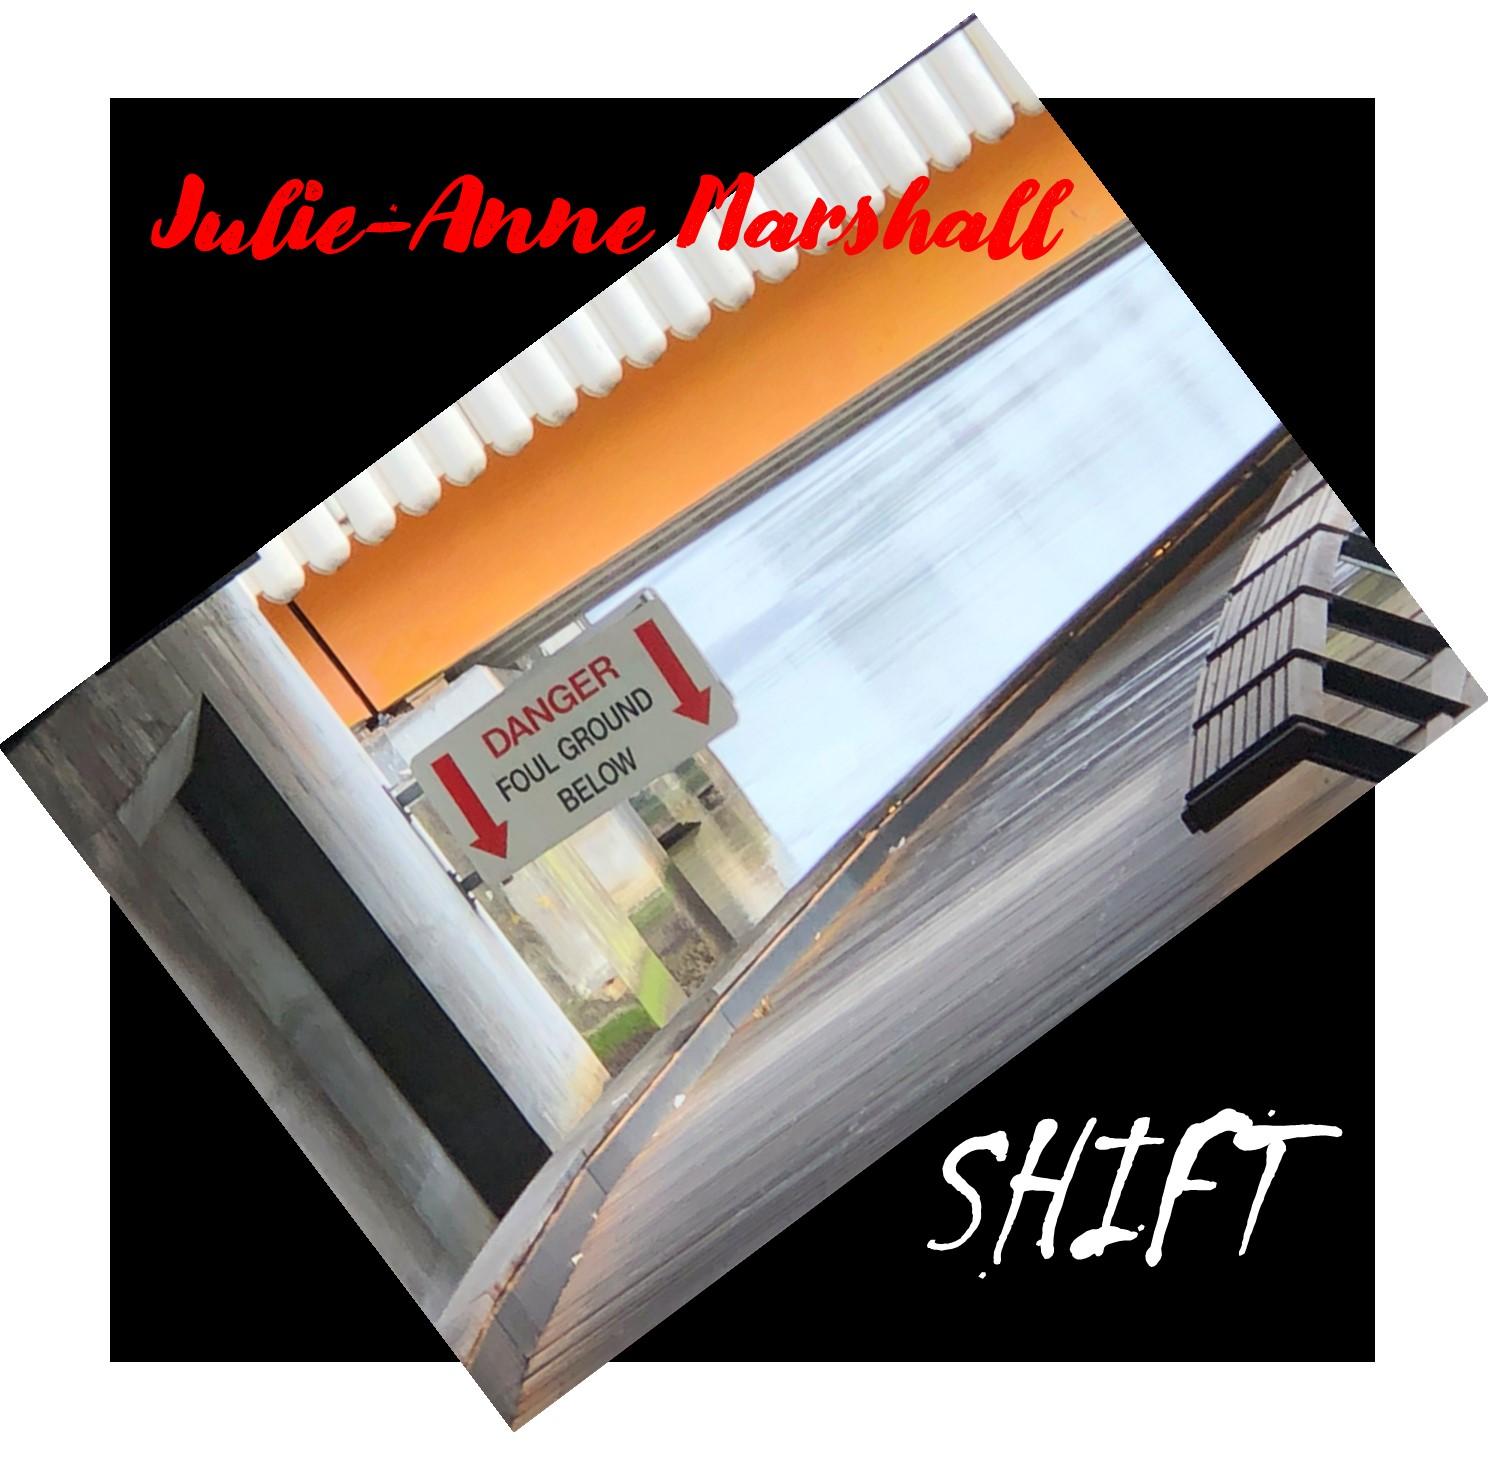 Shift Cover CDBaby jpg